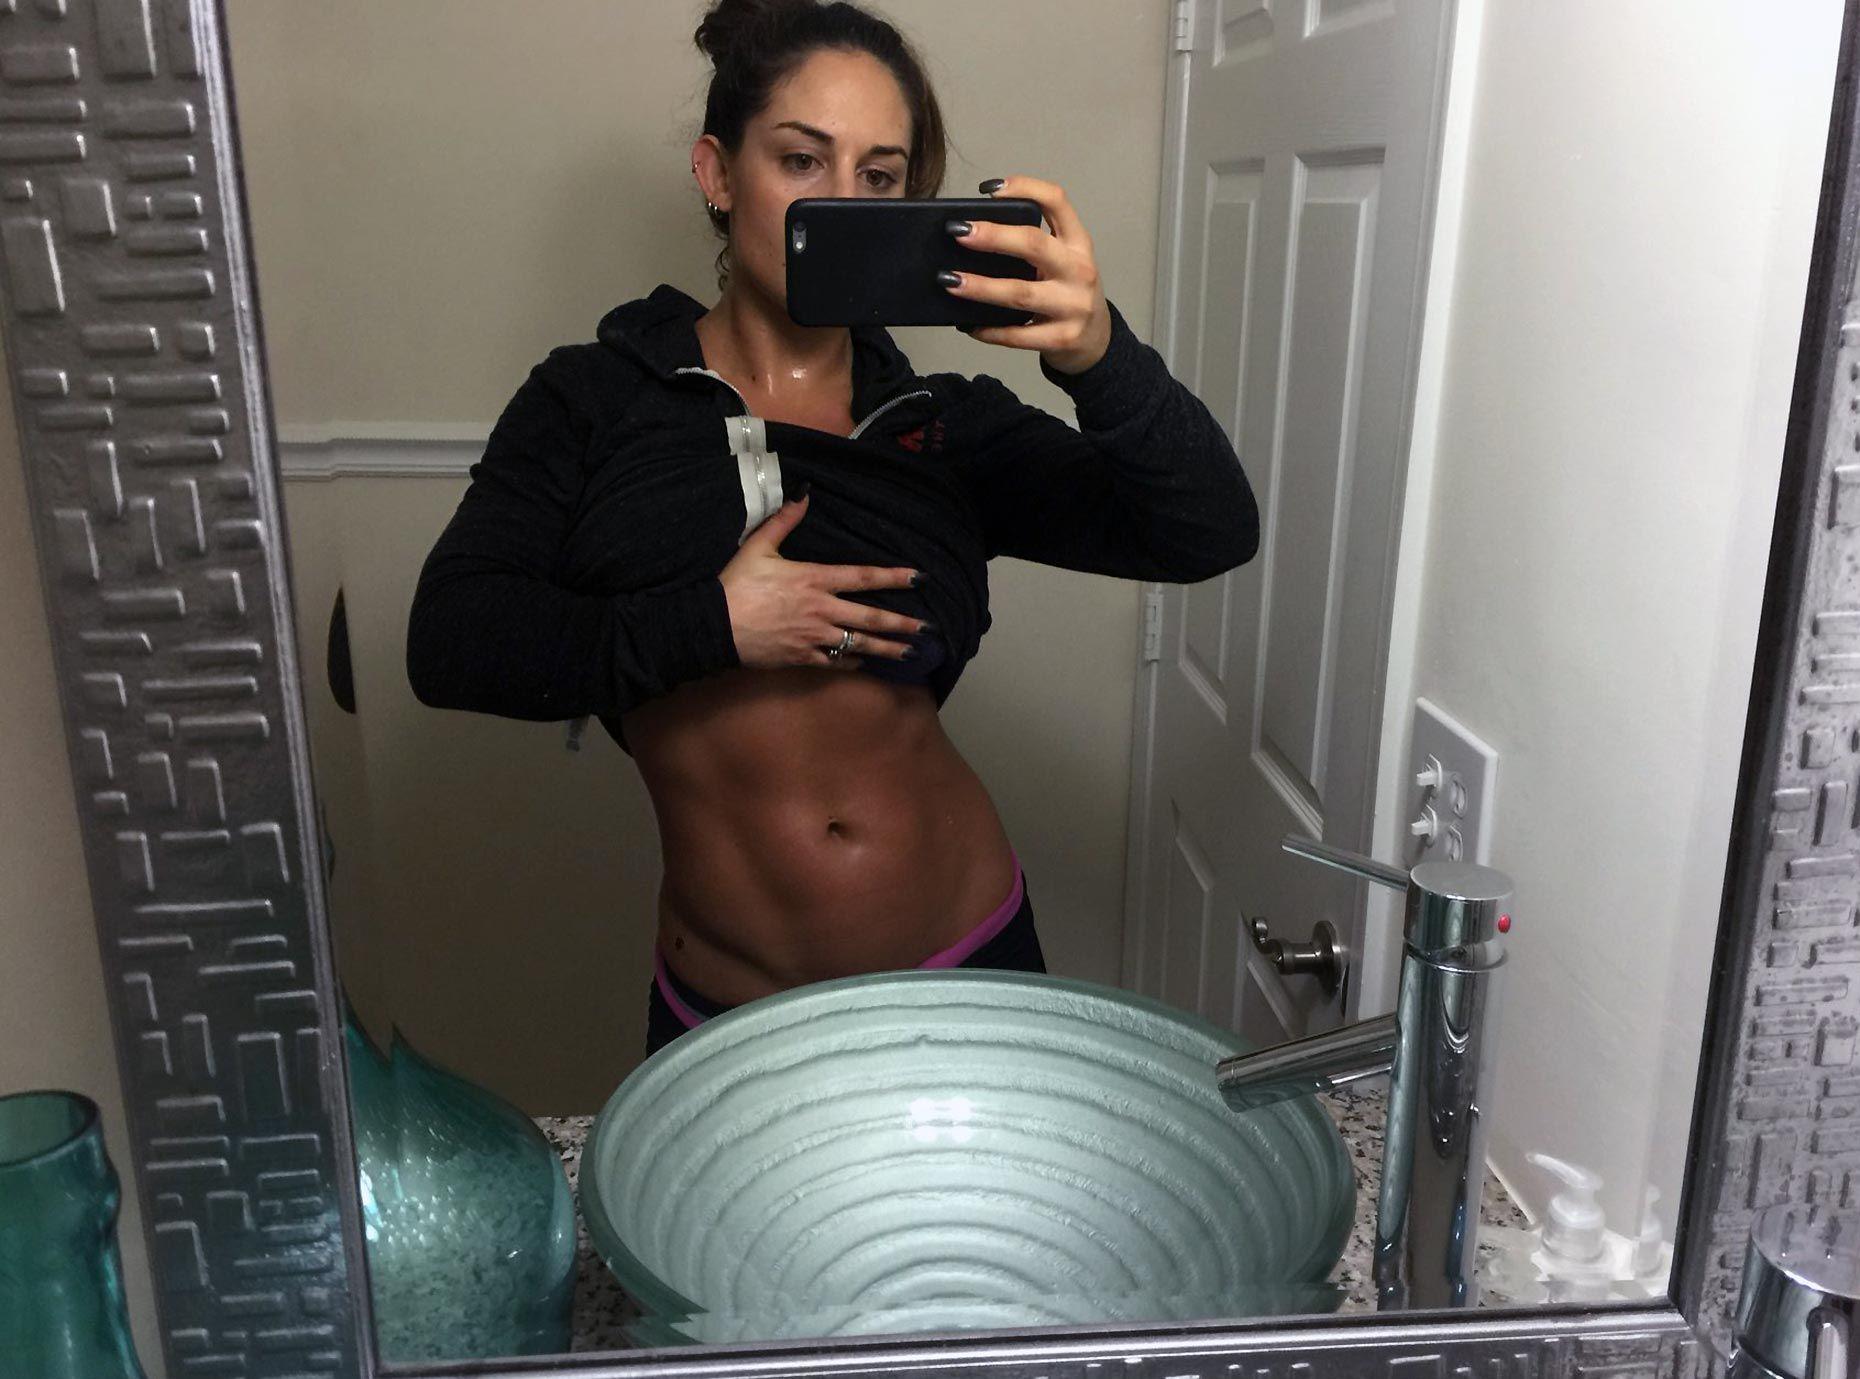 Celeste Bonin Nude Leaked The Fappening & Sexy 0245